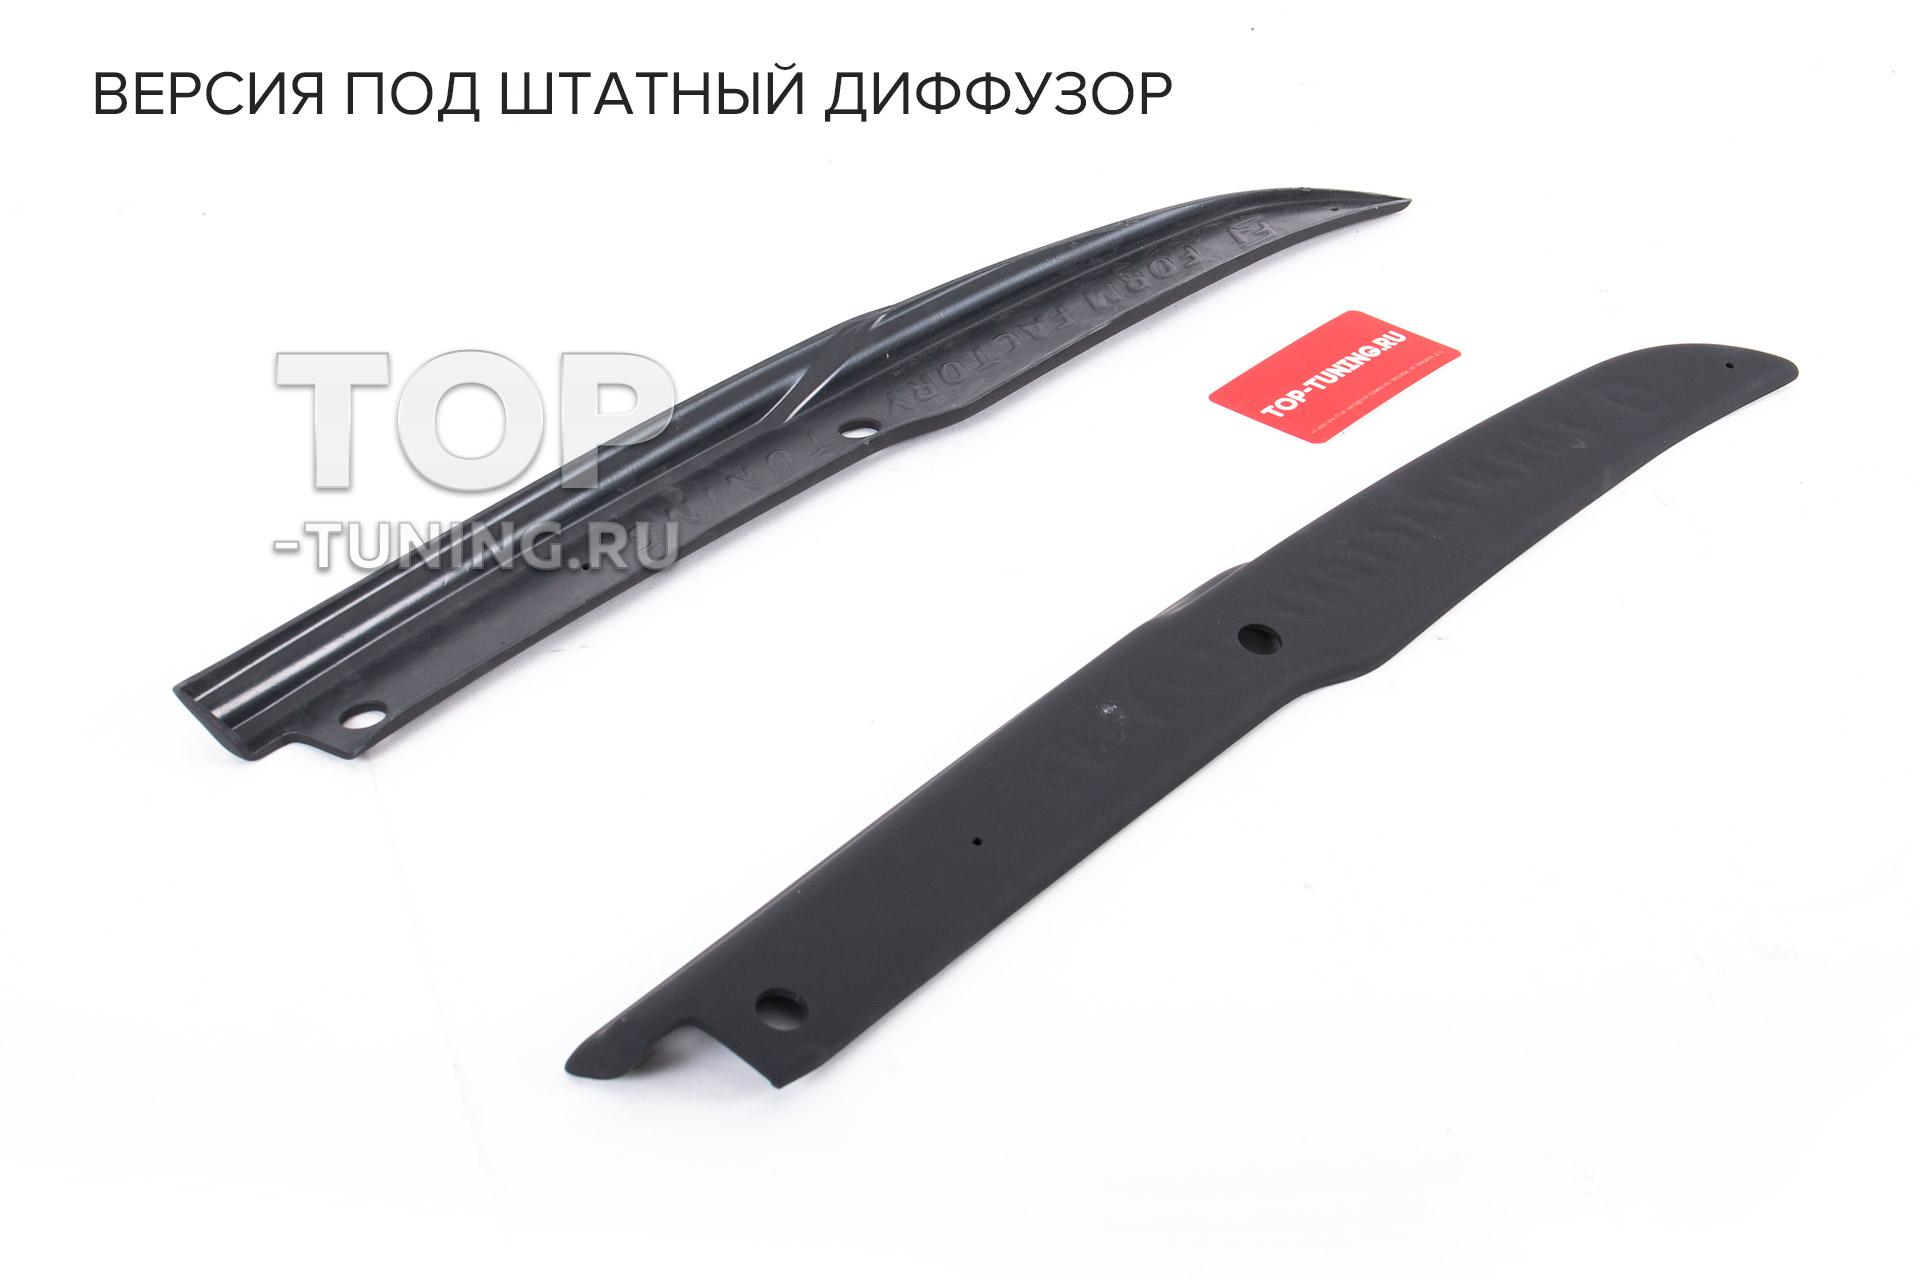 10188 Элероны Consul S-Edition на задний бампер для Toyota Camry XV70